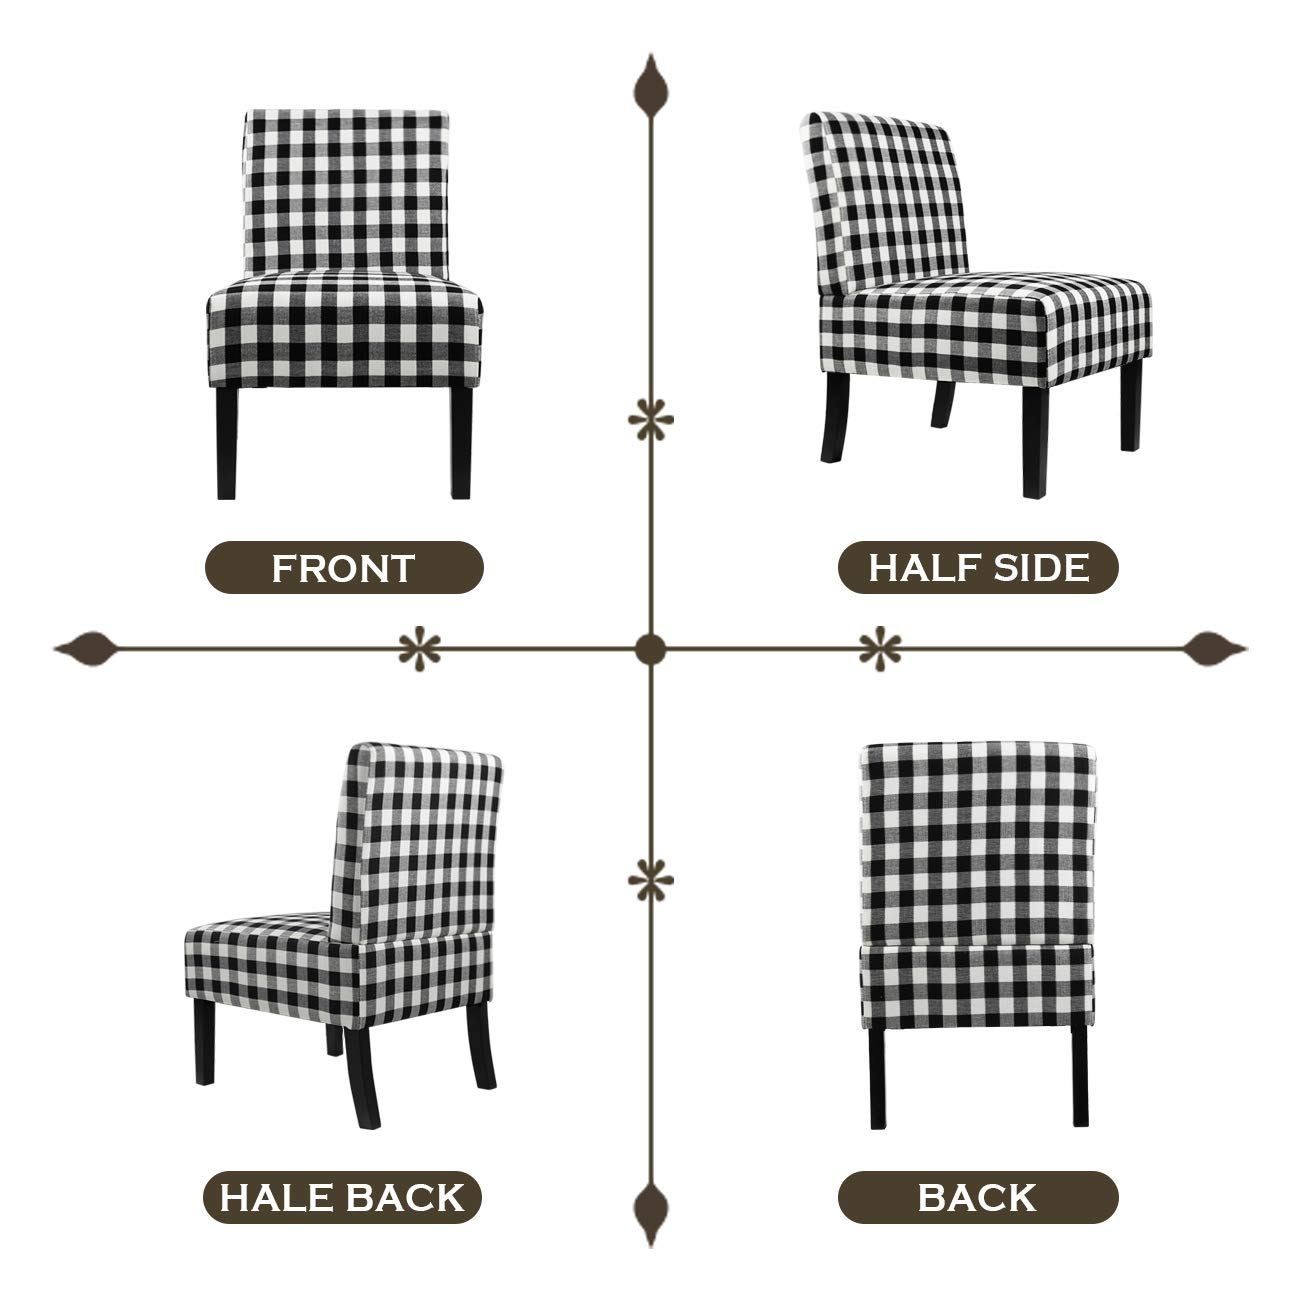 AODAILIHB Armless Accent Chair Modern Fabric Printing Leisure Chair Single Sofa Deco Living Room Bedroom Office Armless Chair Lattice 1Pcs